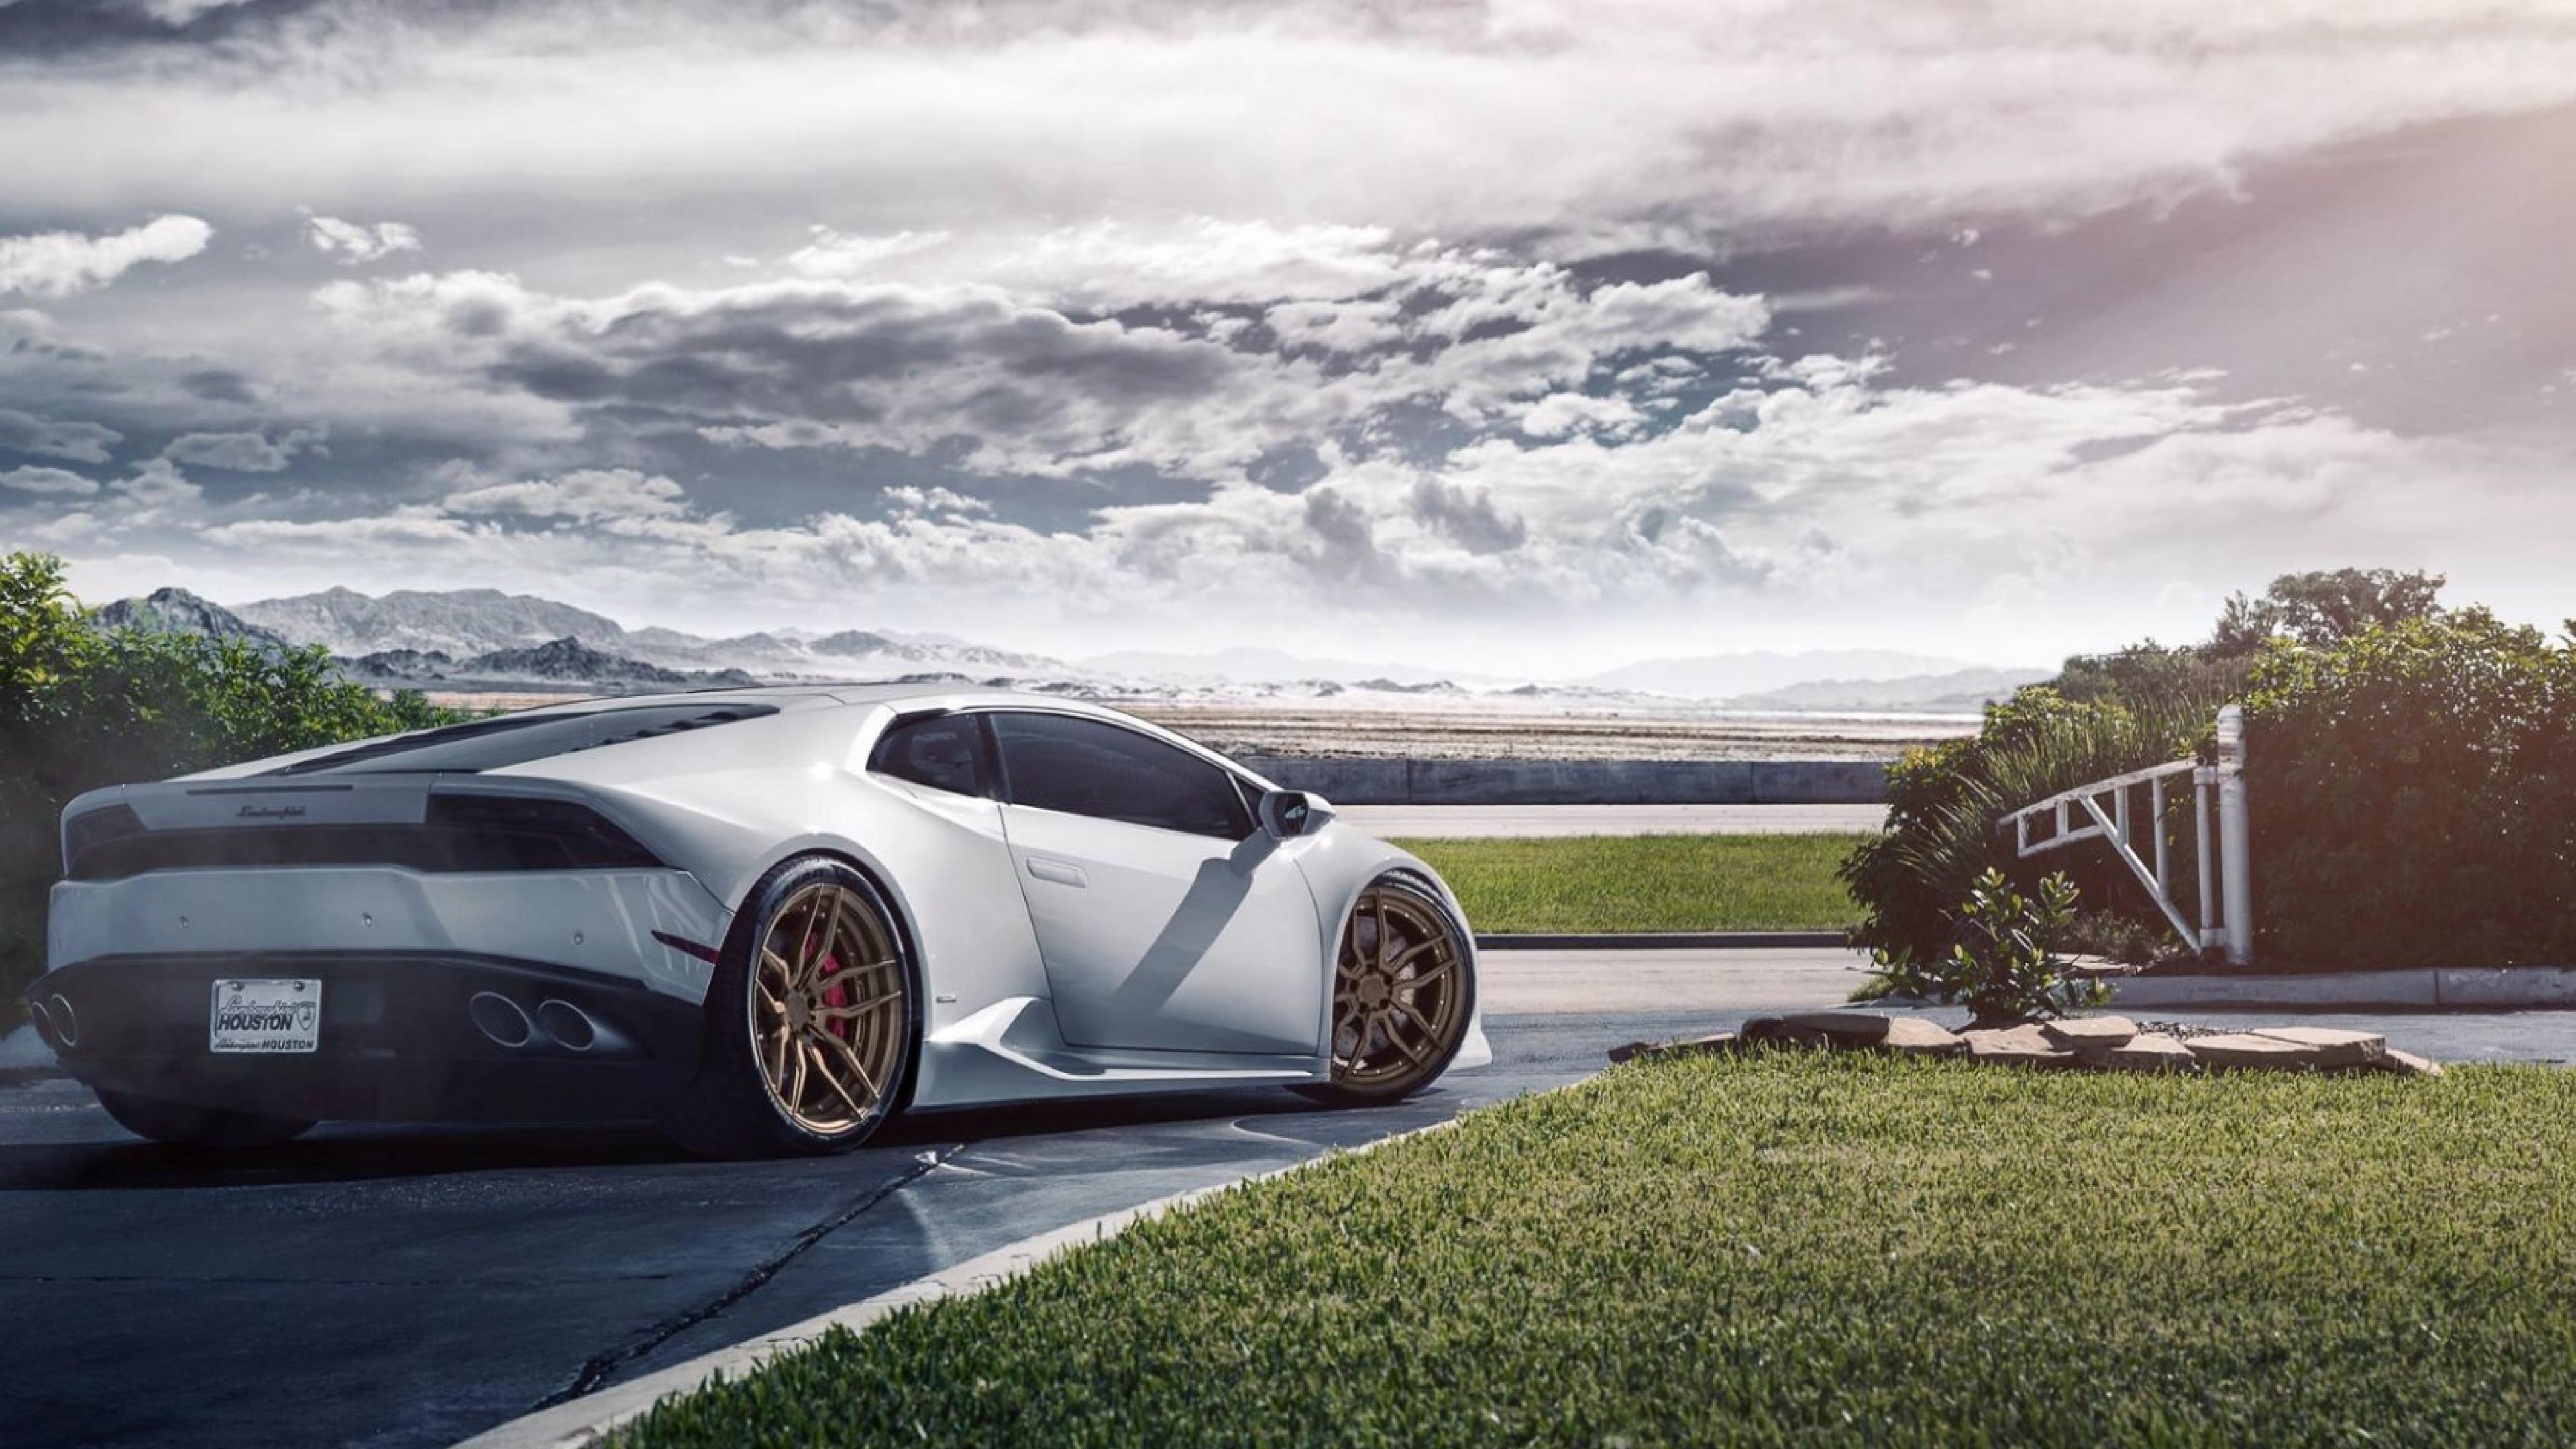 2016 Rosso Mars Novara Edizione Lamborghini Huracan Wallpapers ...